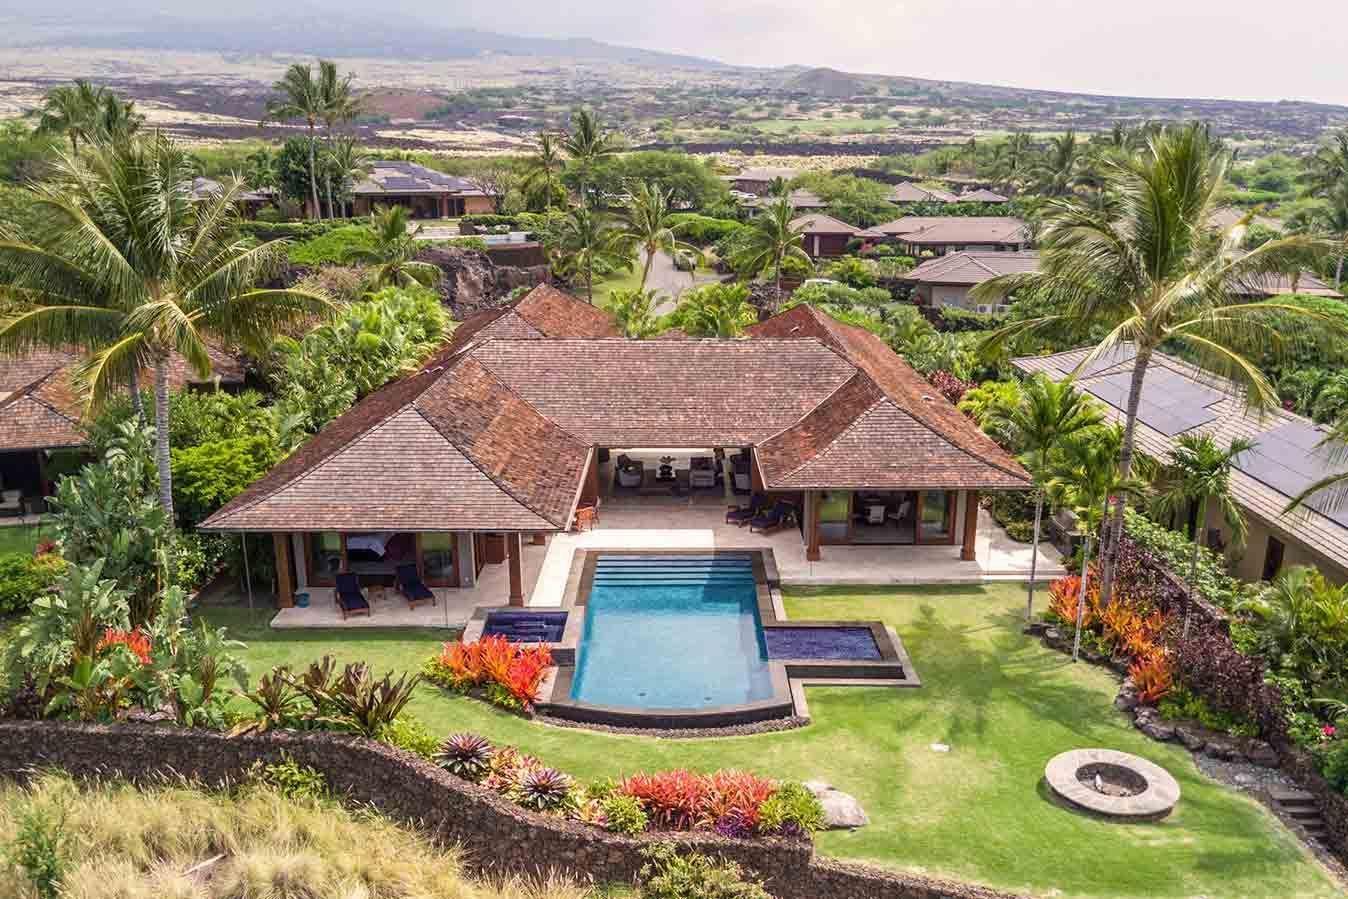 5 Bedroom Luxury Vacation Home for Rent Hualalai, Kona